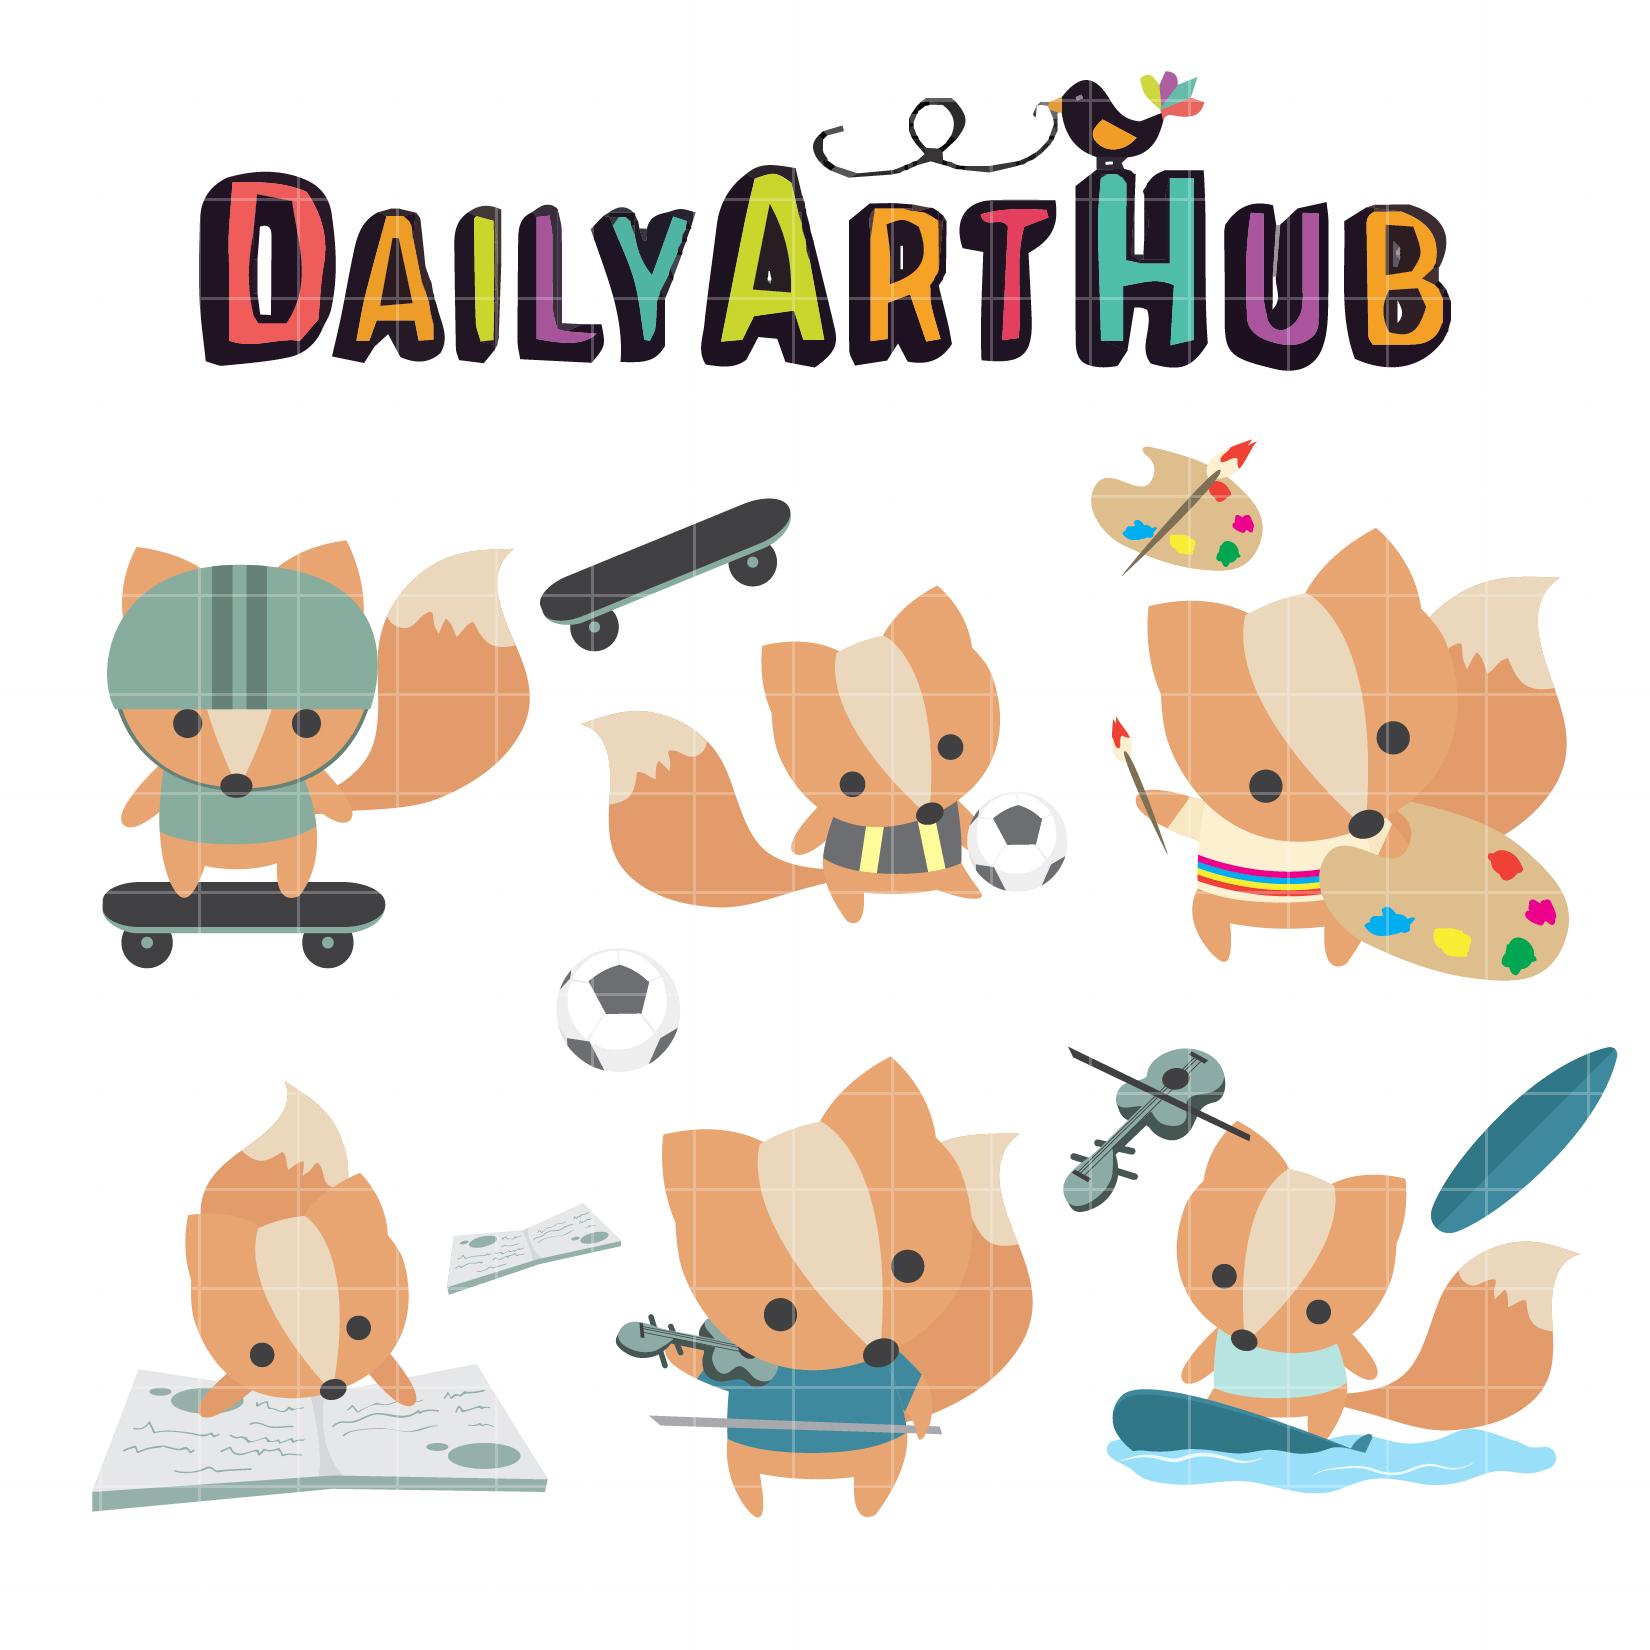 Fox Hobbies Clip Art Set Daily Art Hub Free Clip Art Everyday